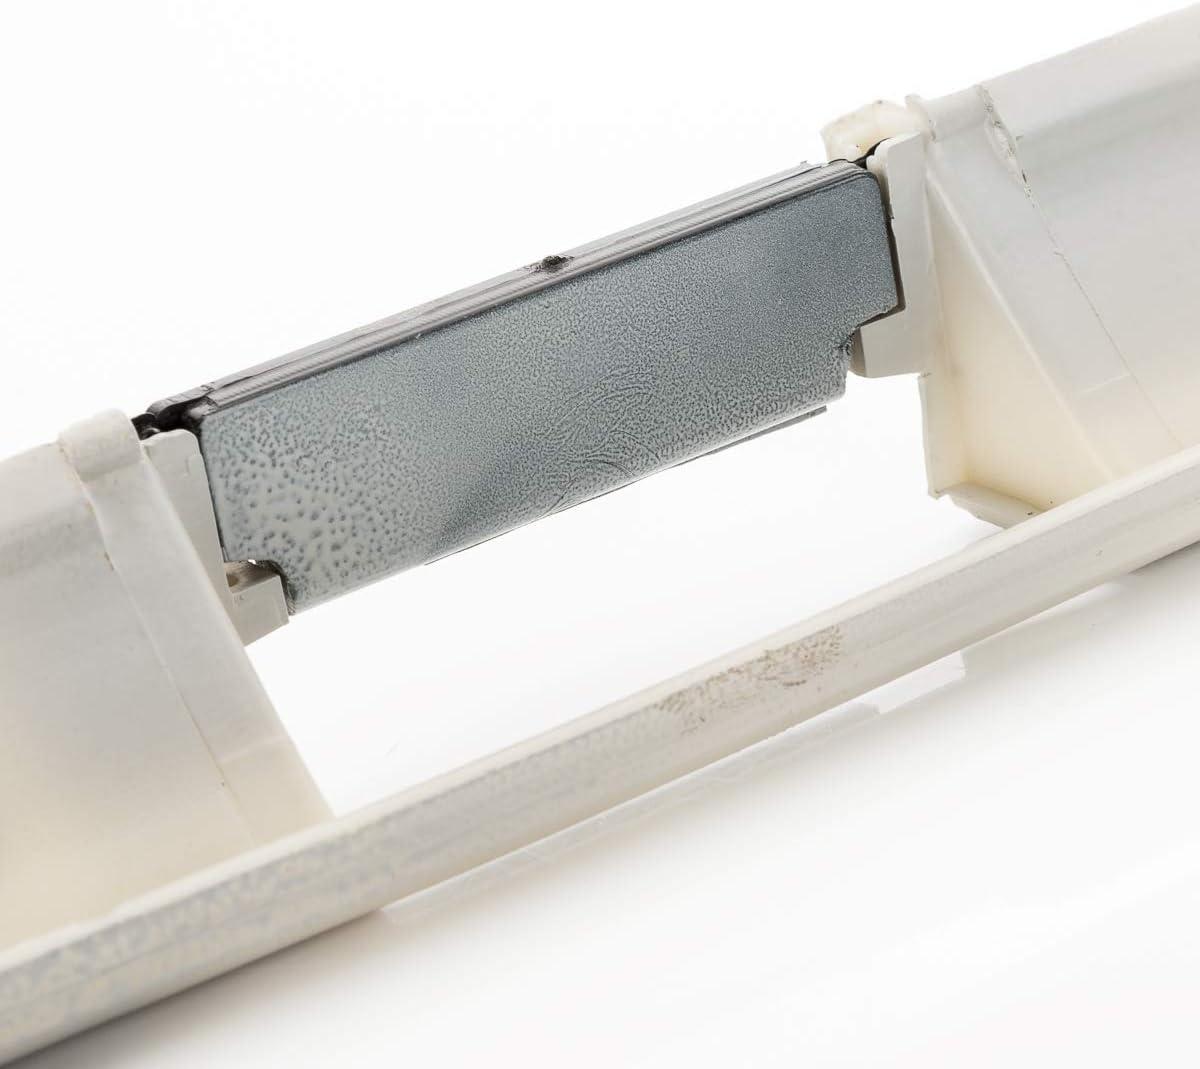 LST Griffleiste Kofferraum Heckklappenleiste Abdeckung POLO CLASSIC 6KV2